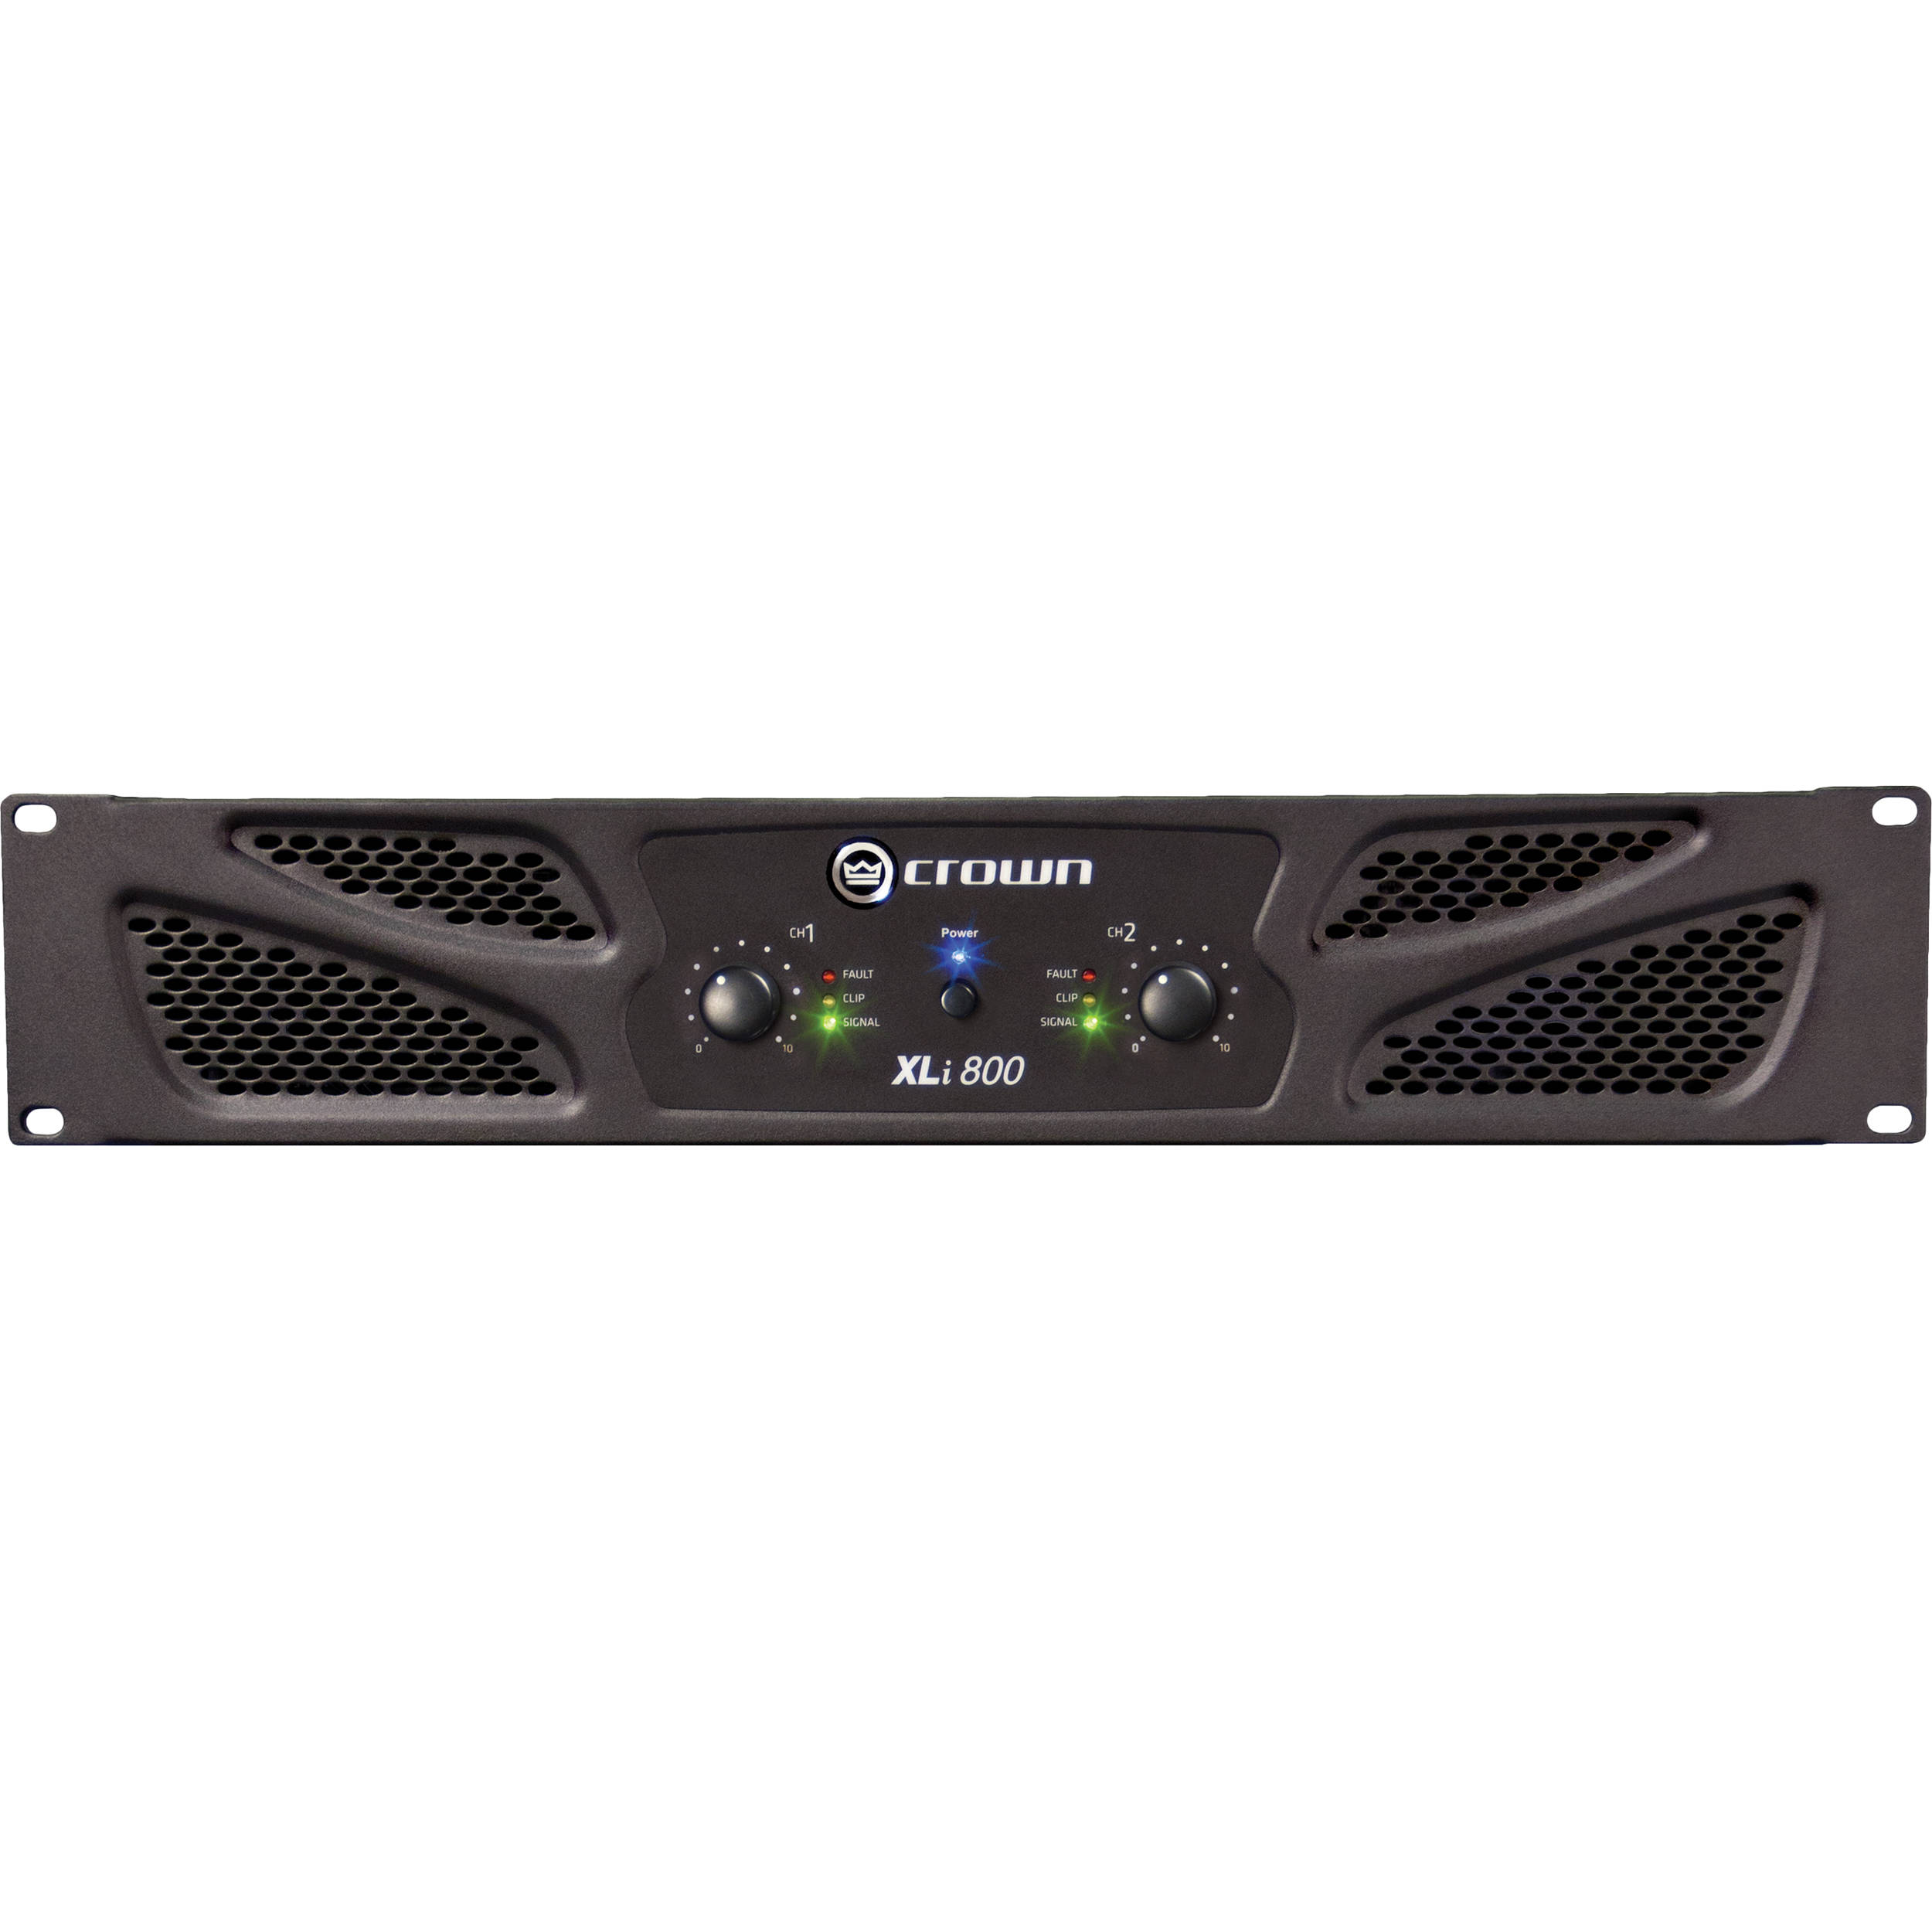 crown audio xli 800 stereo power amplifier xli800 b h photo video. Black Bedroom Furniture Sets. Home Design Ideas